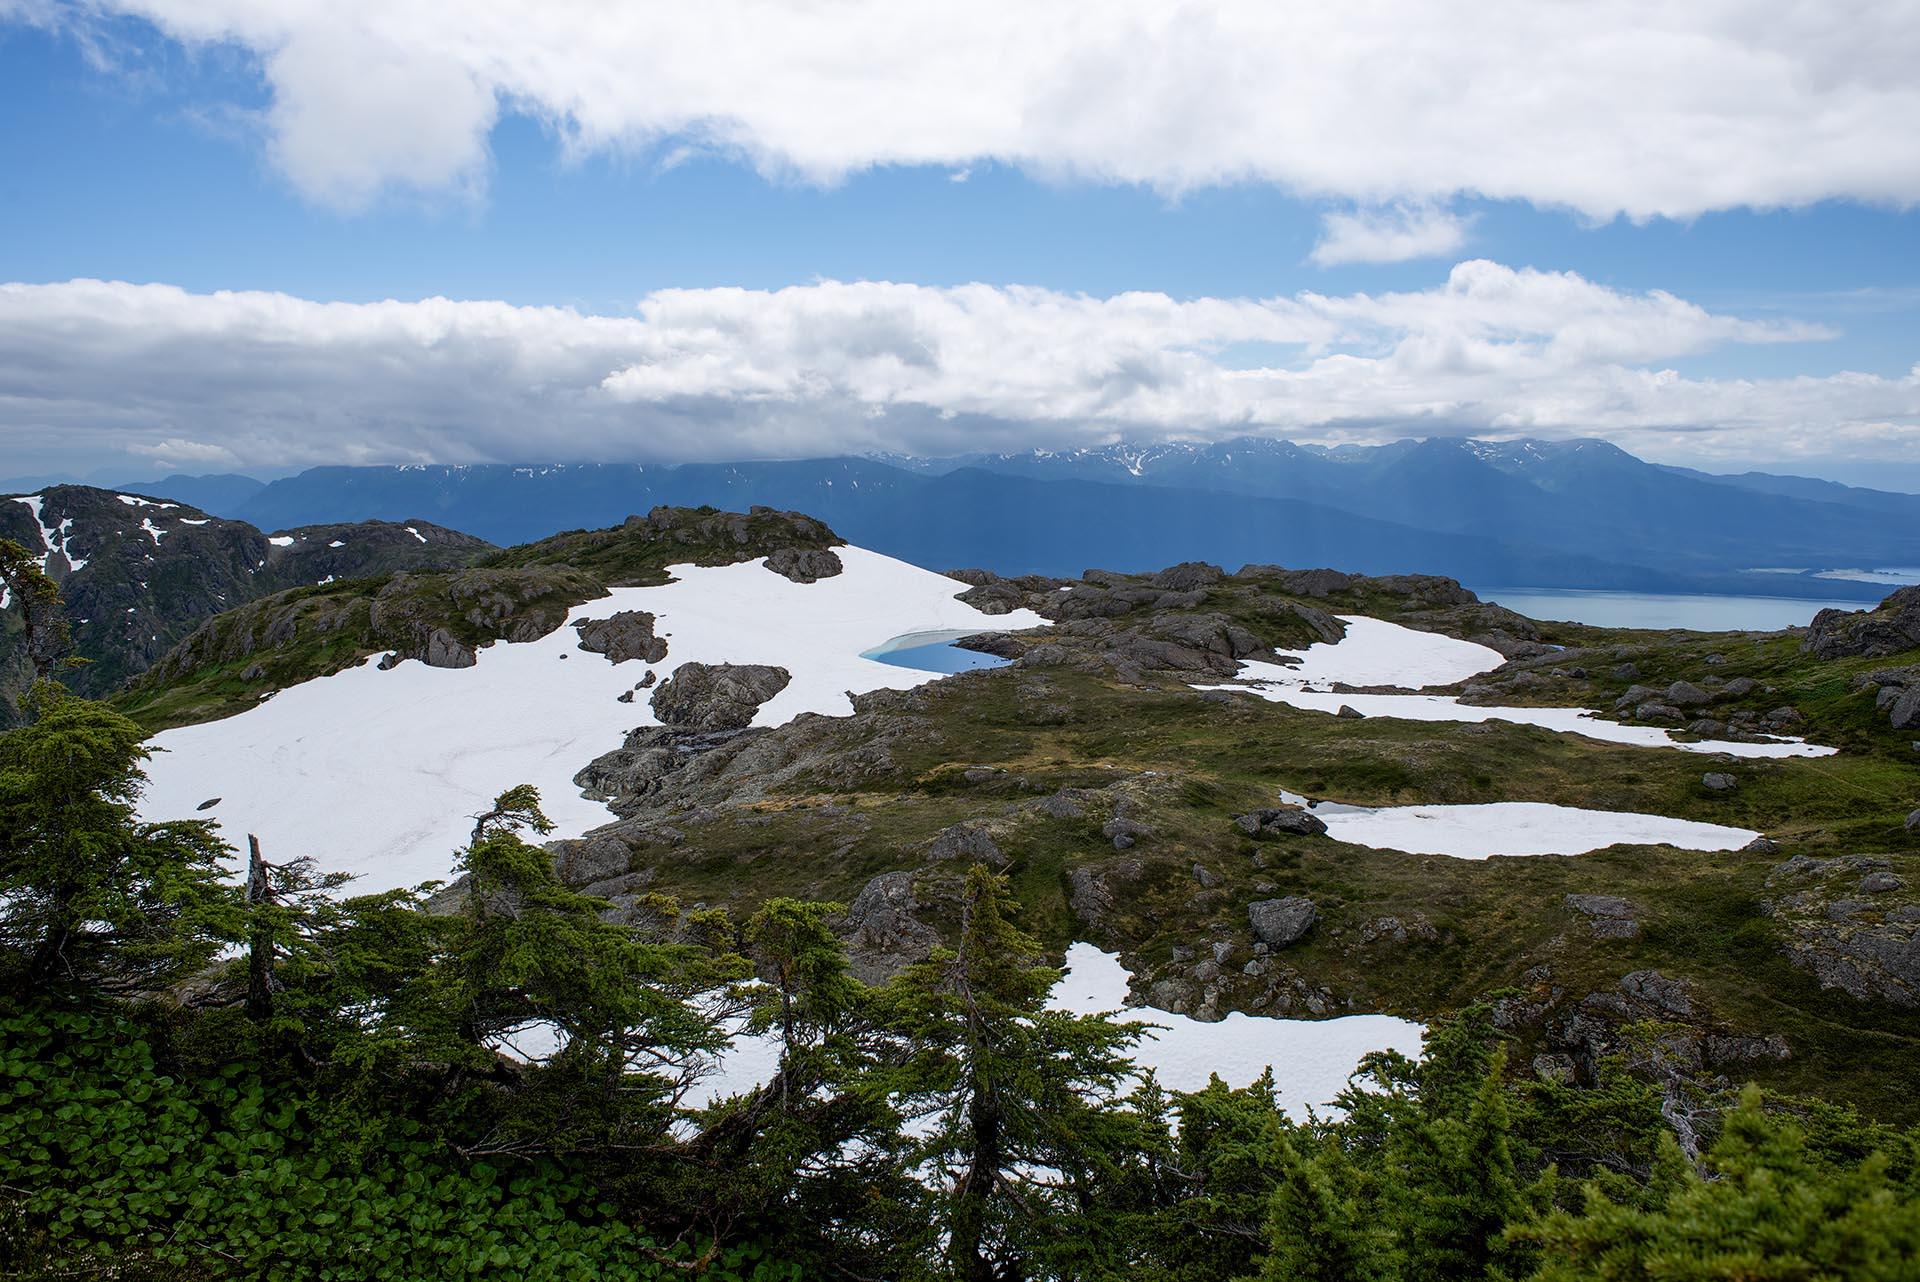 The paradise on top of Mt. Jumbo.